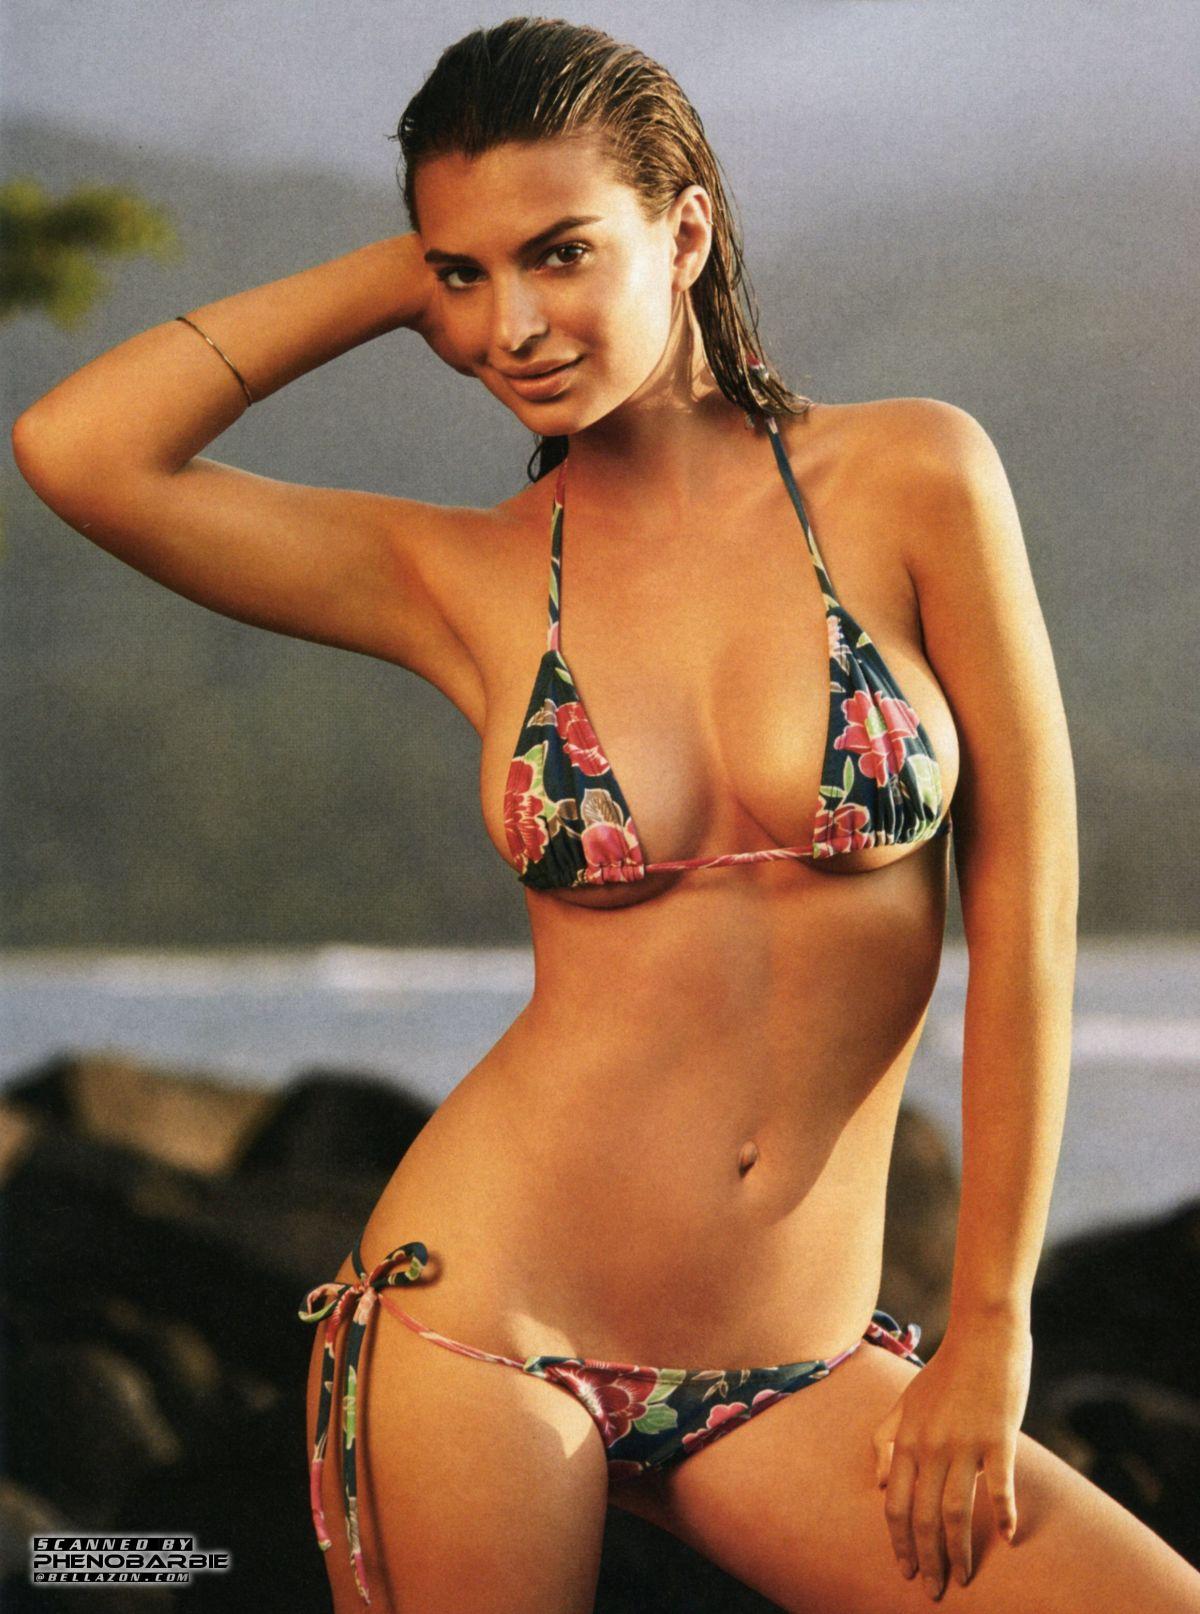 Bikini Nina Bajerska nudes (92 photo), Topless, Hot, Selfie, butt 2019